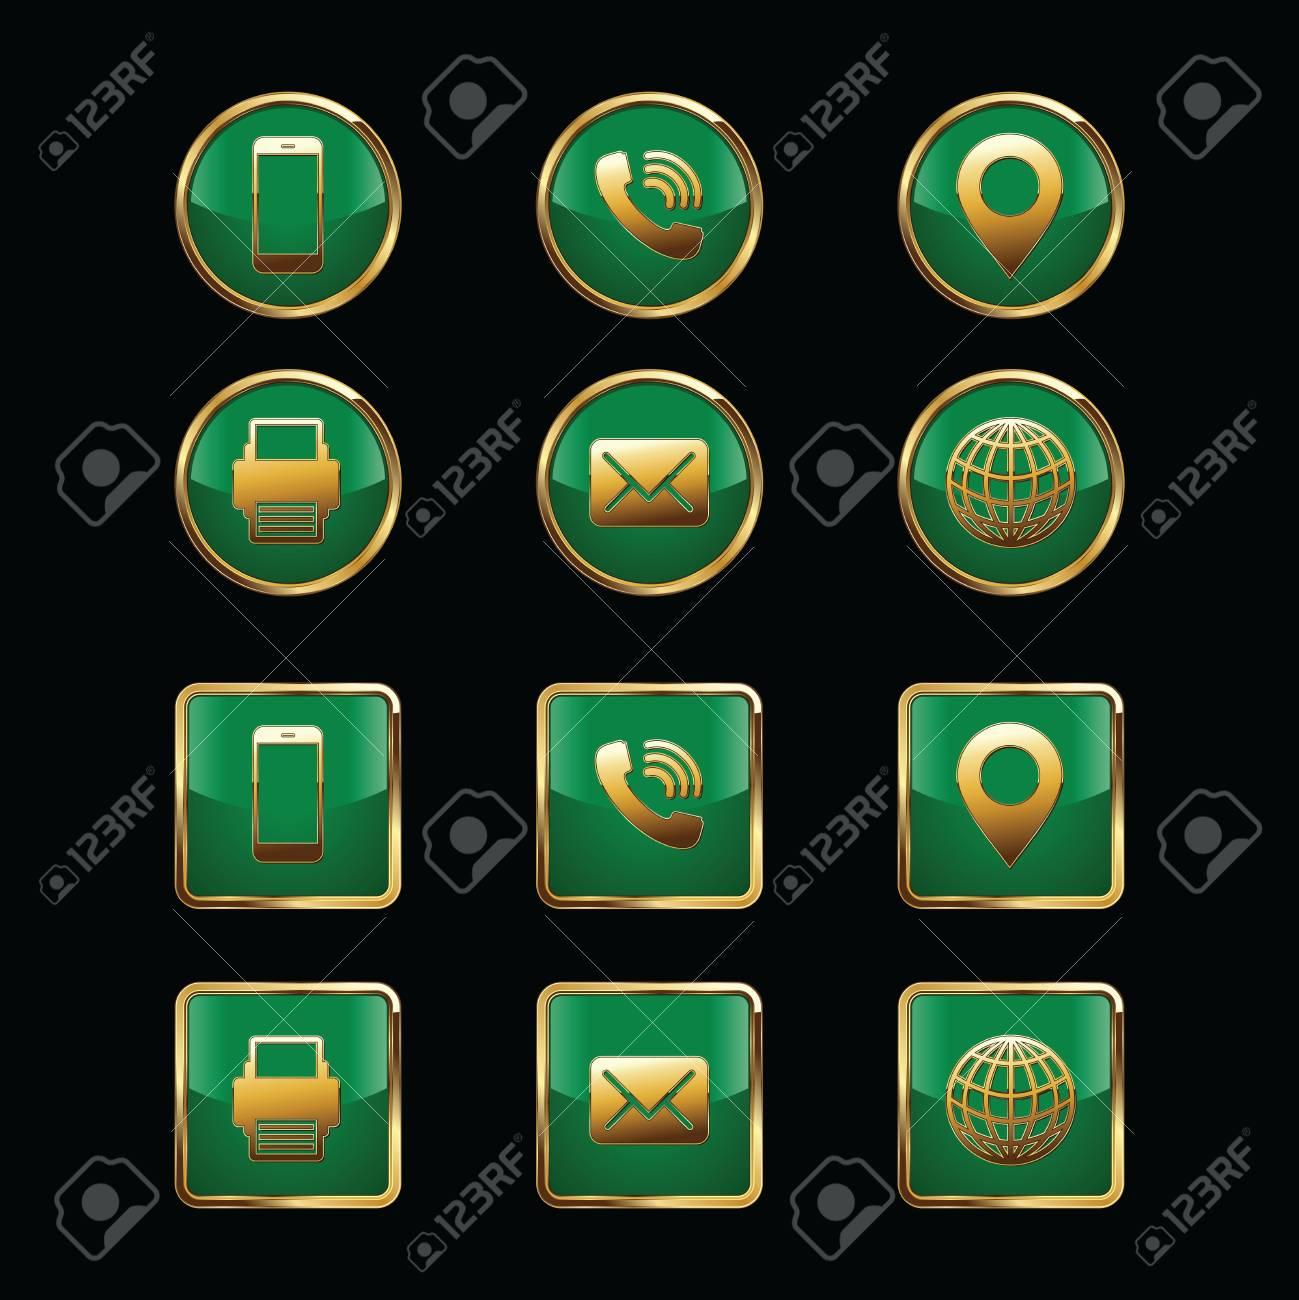 Business Card Icon Set. Web Icons. Luxury Icons. Royalty Free ...